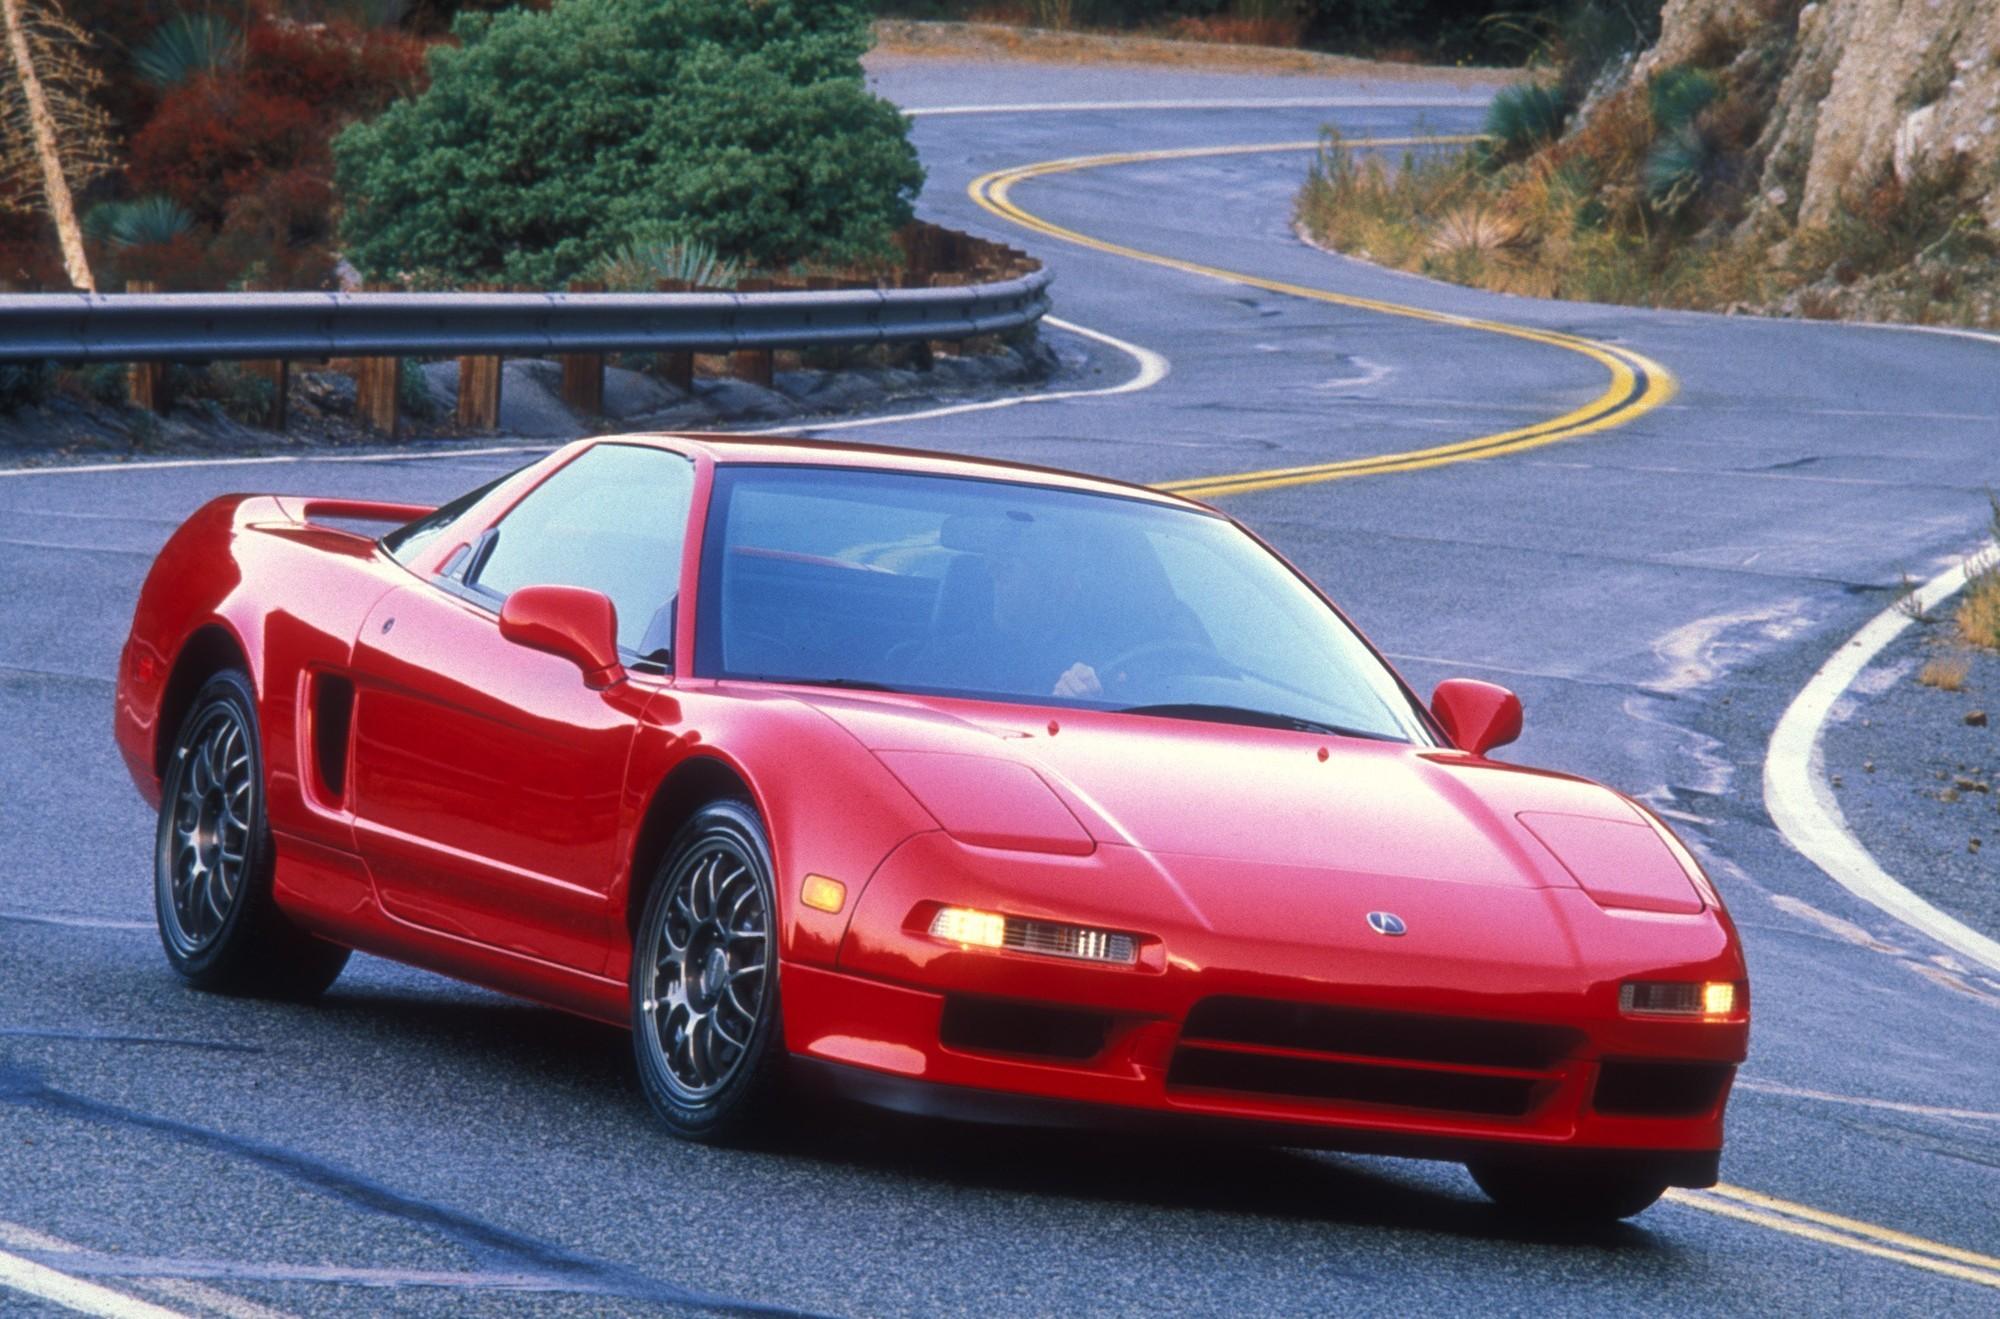 1999 Acura NSX